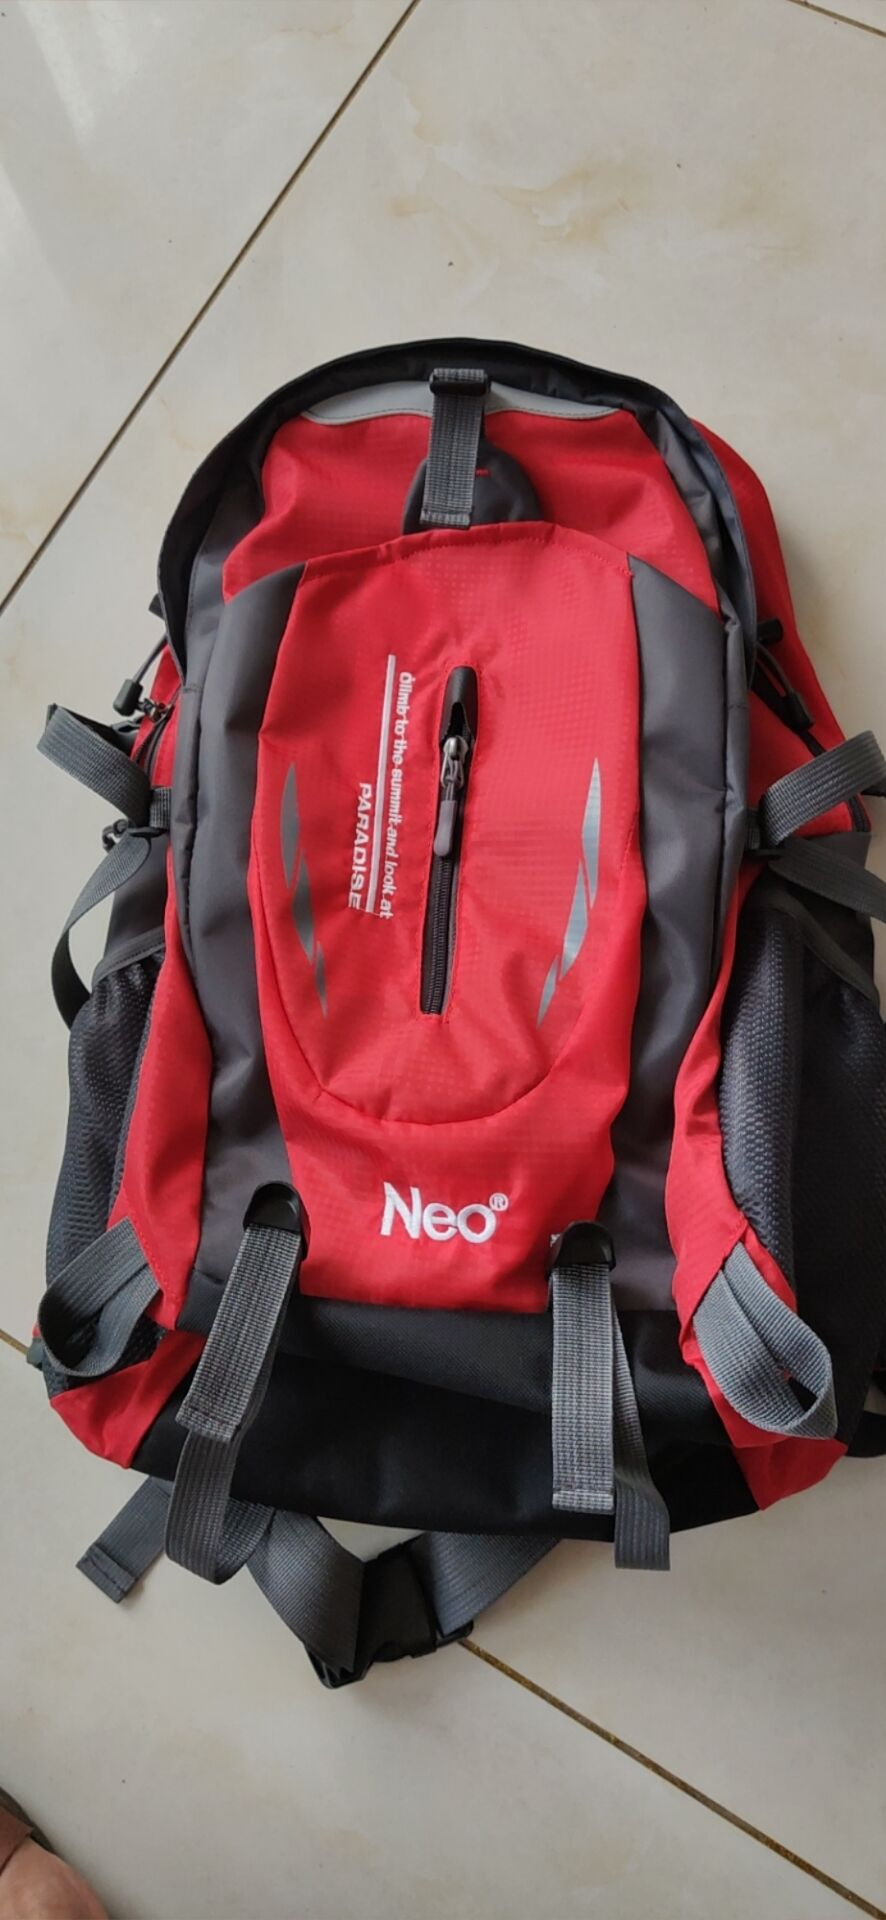 40L Waterproof Outdoor Sports Backpack Travel Hiking Camping Rucksack Bag Hot FY